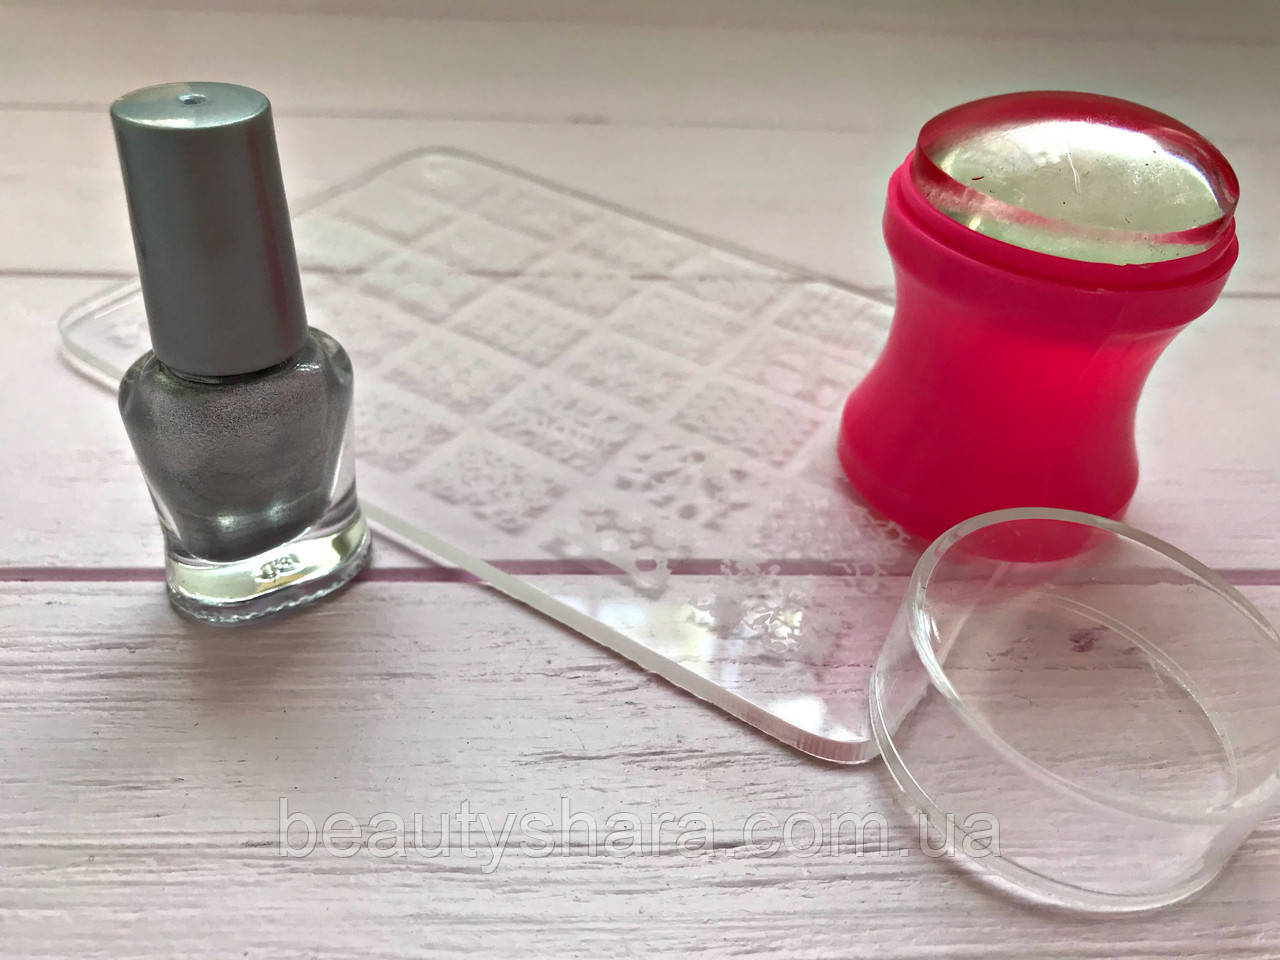 Стемпинг для ногтей + Пластина + Краска для стемпинга Набор